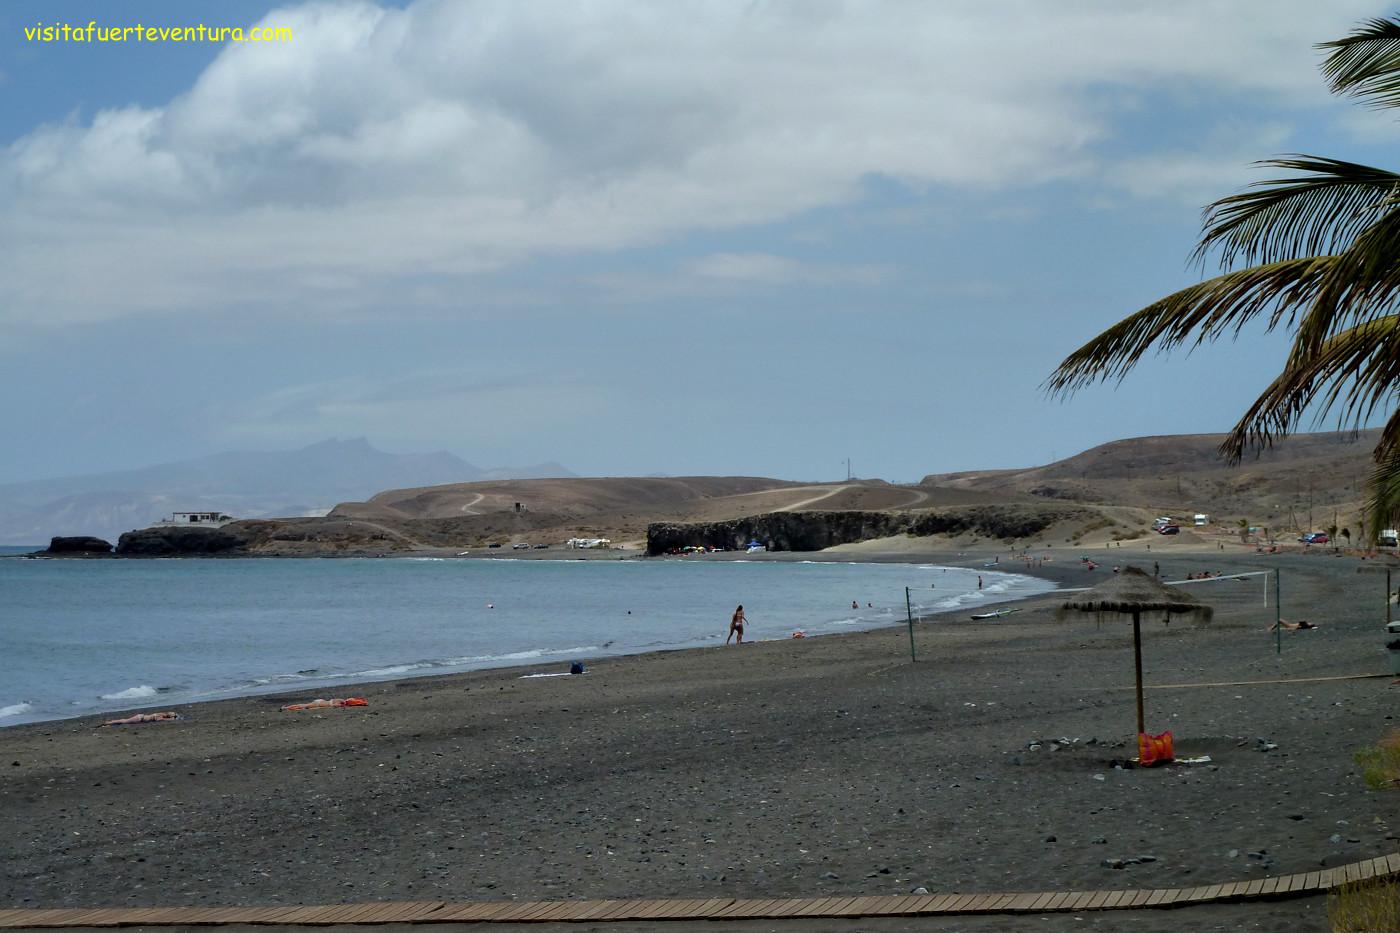 playa de tarajalejo